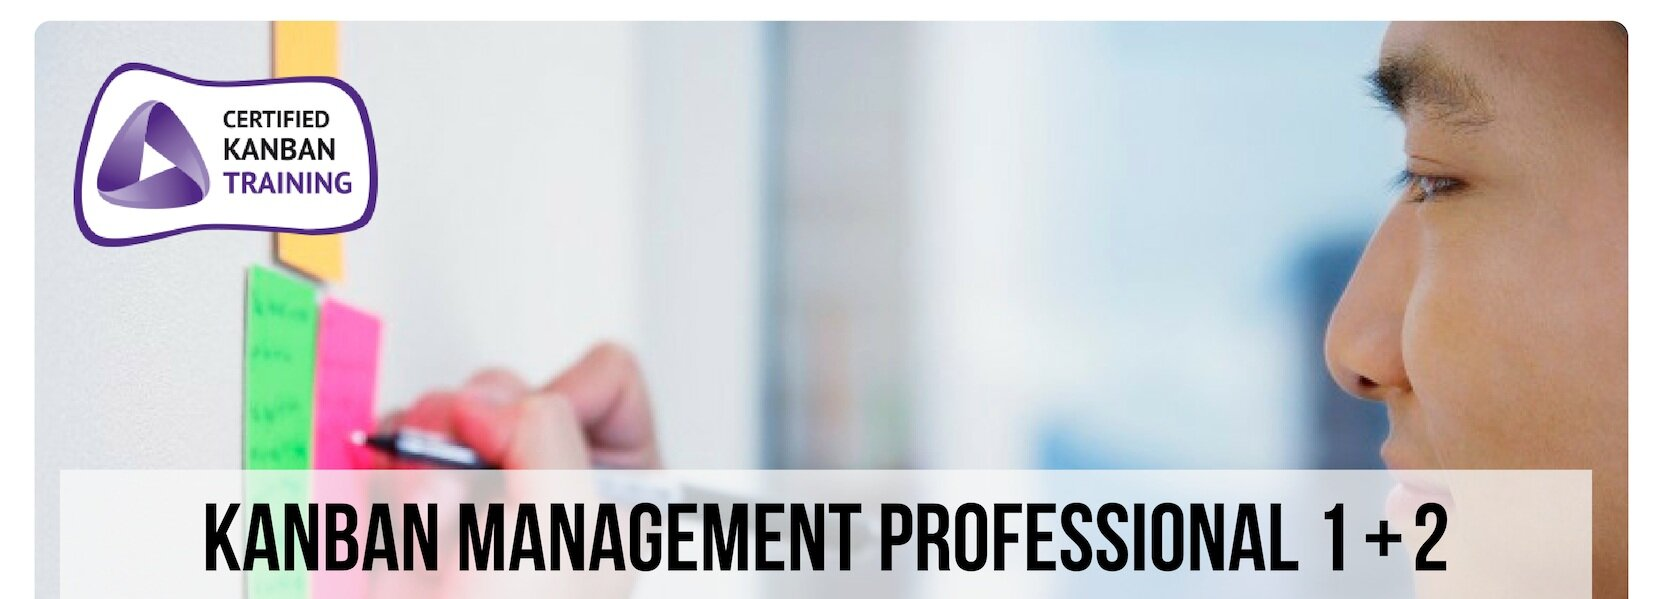 Kanban Management Professional.jpg